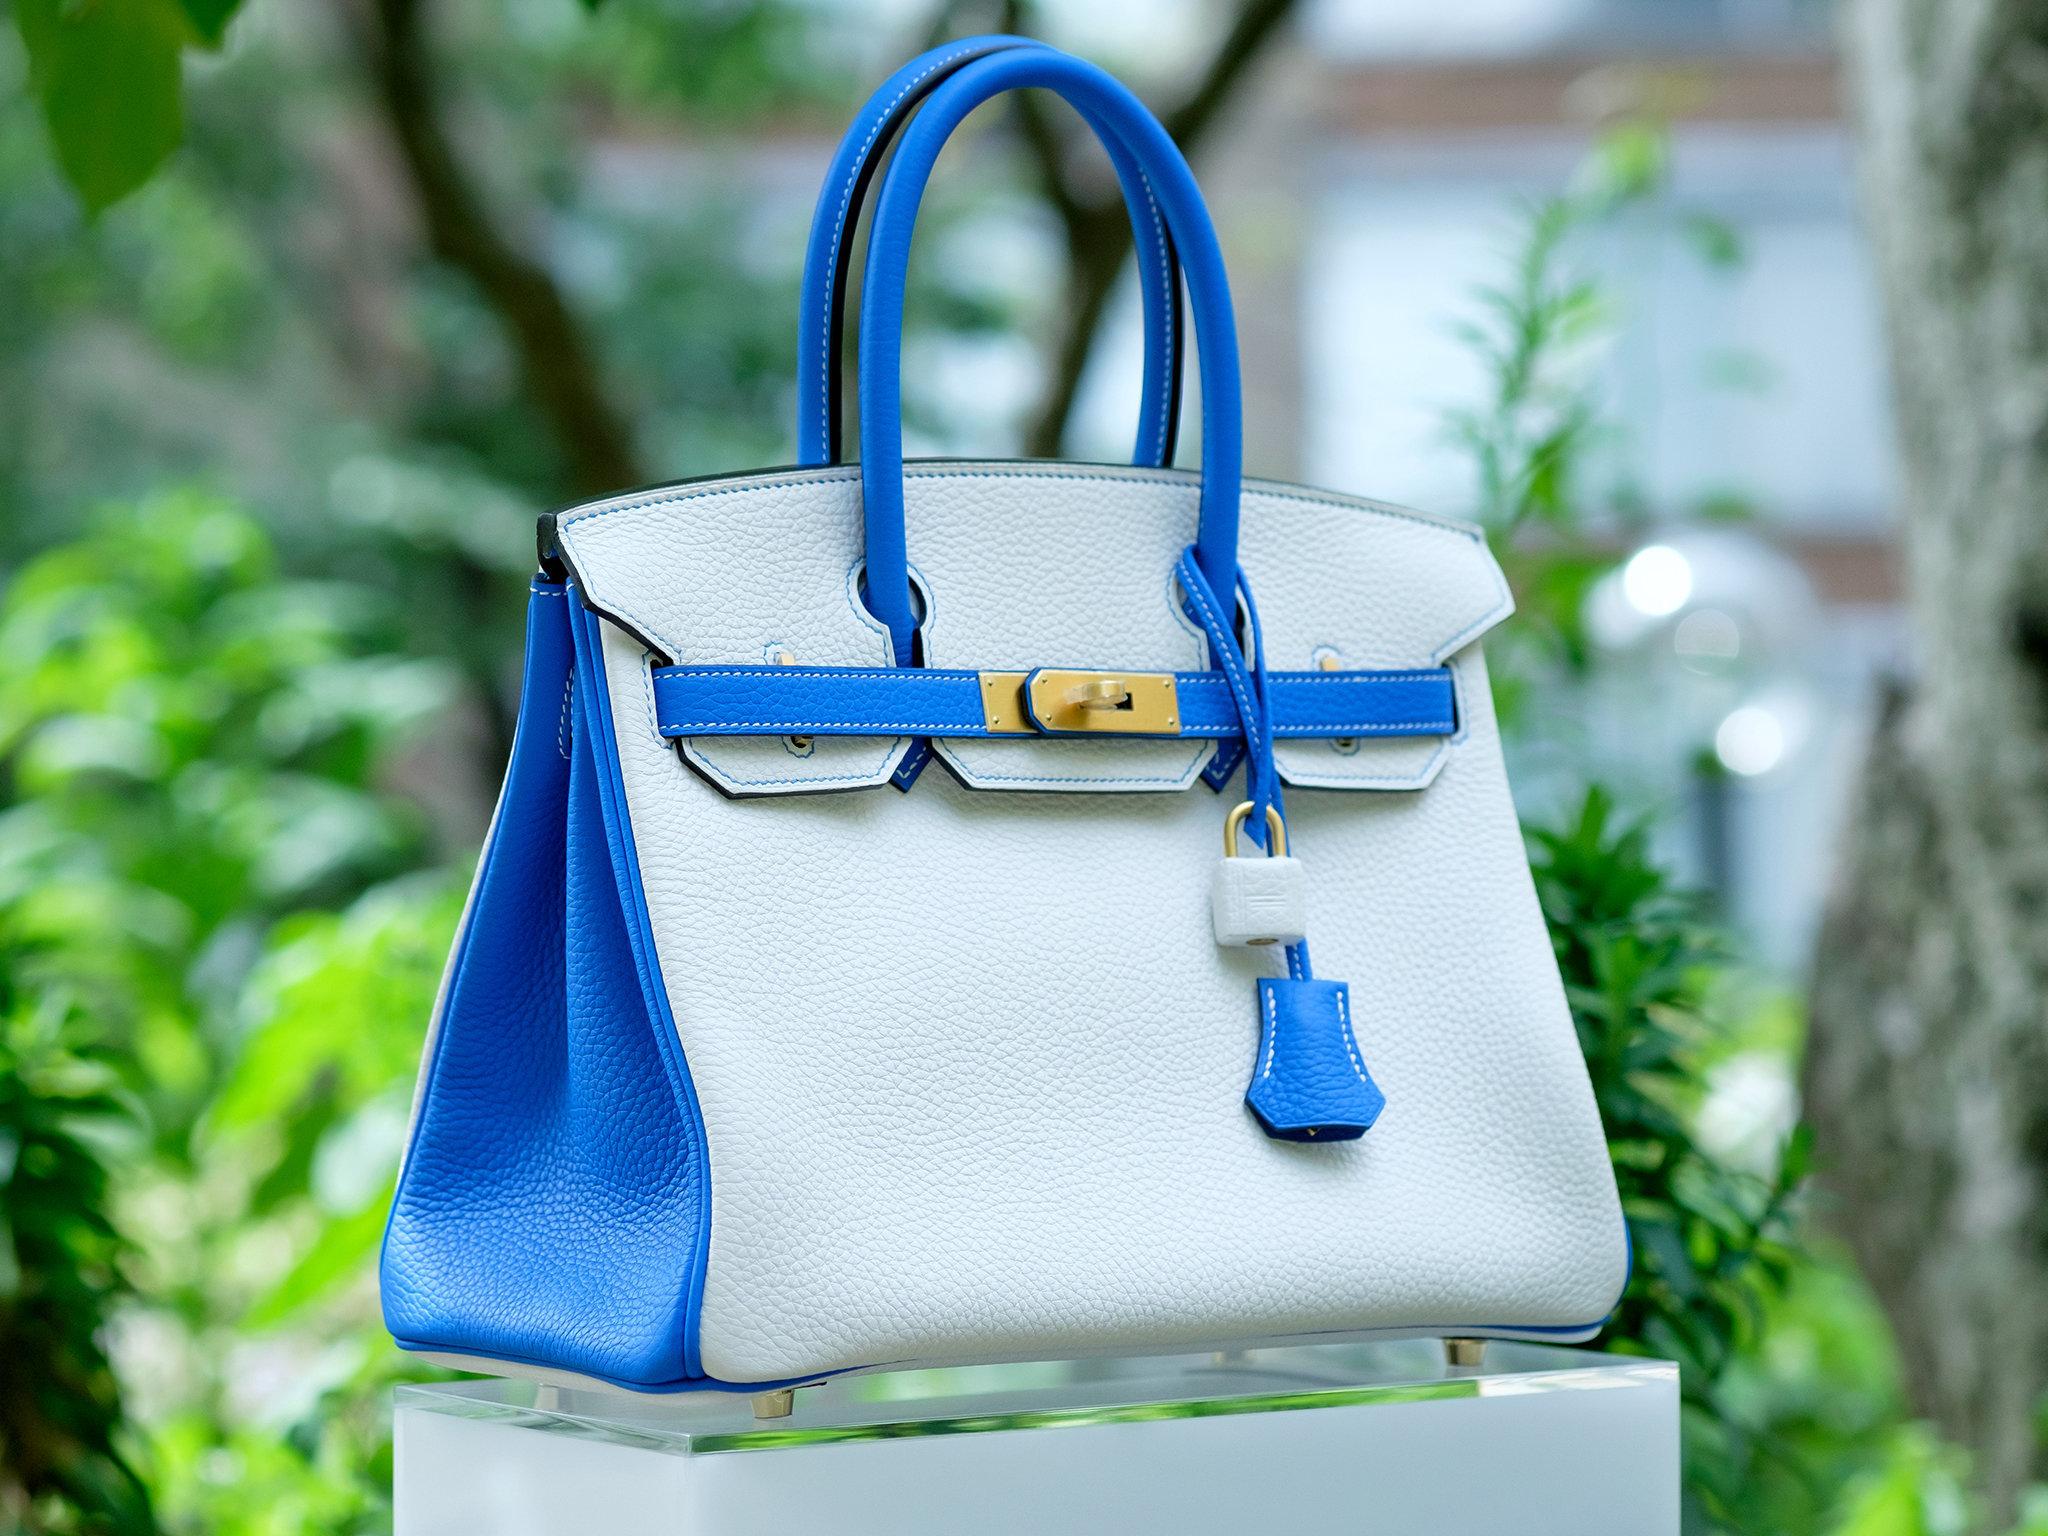 Photographed for Madison Avenue Couture (blog.madisonavenuecouture.com)